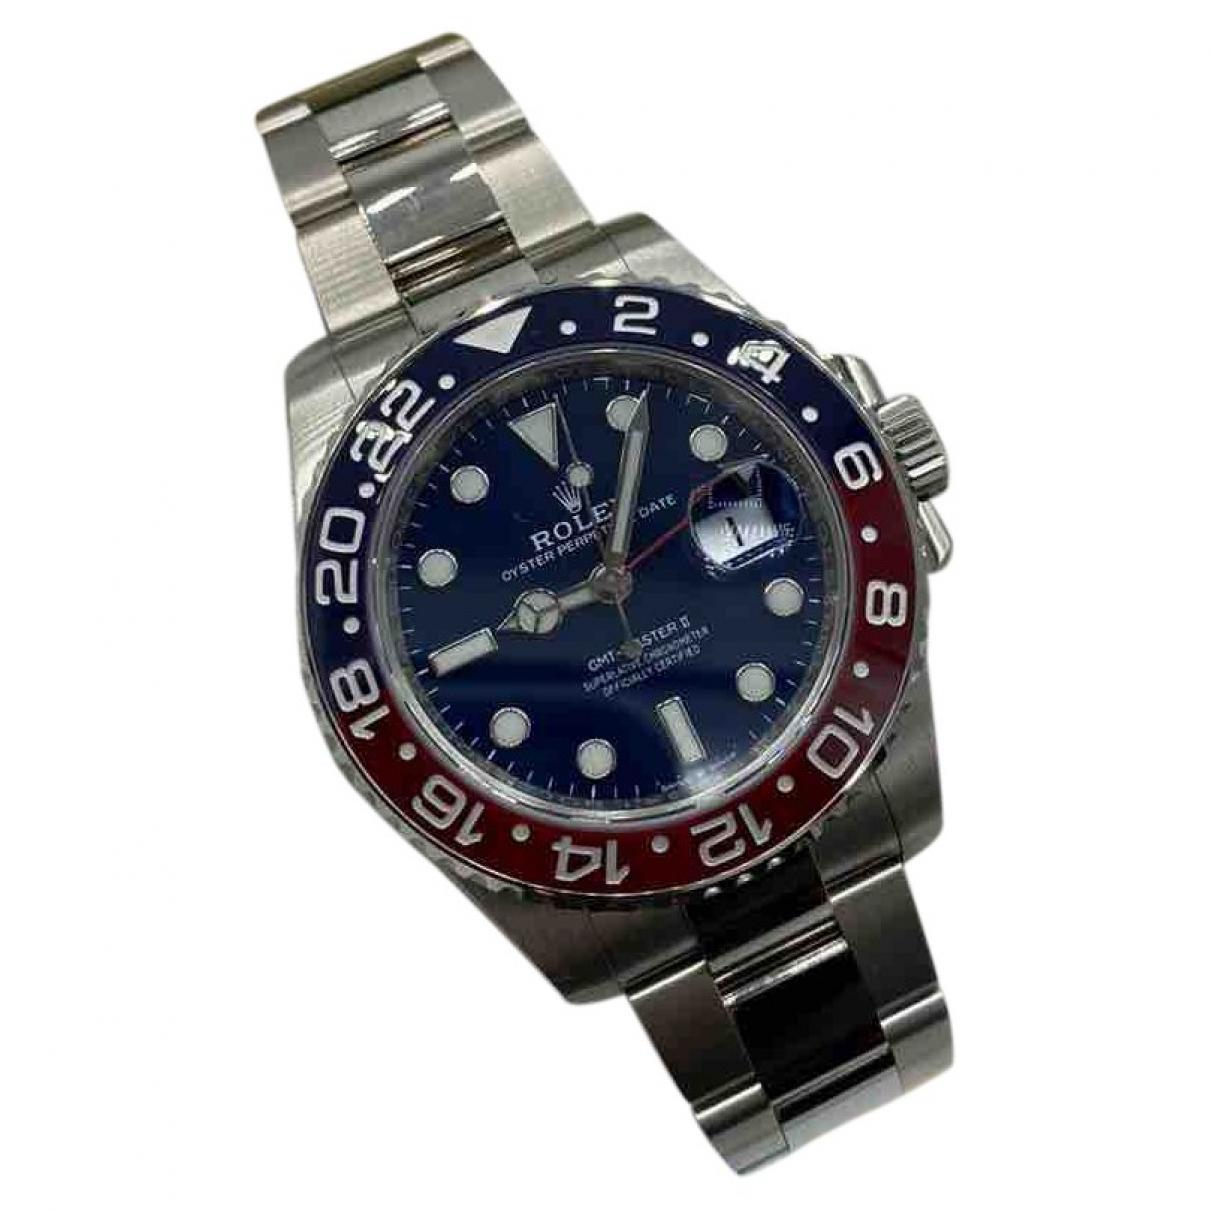 Relojes GMT-Master II de Oro blanco Rolex